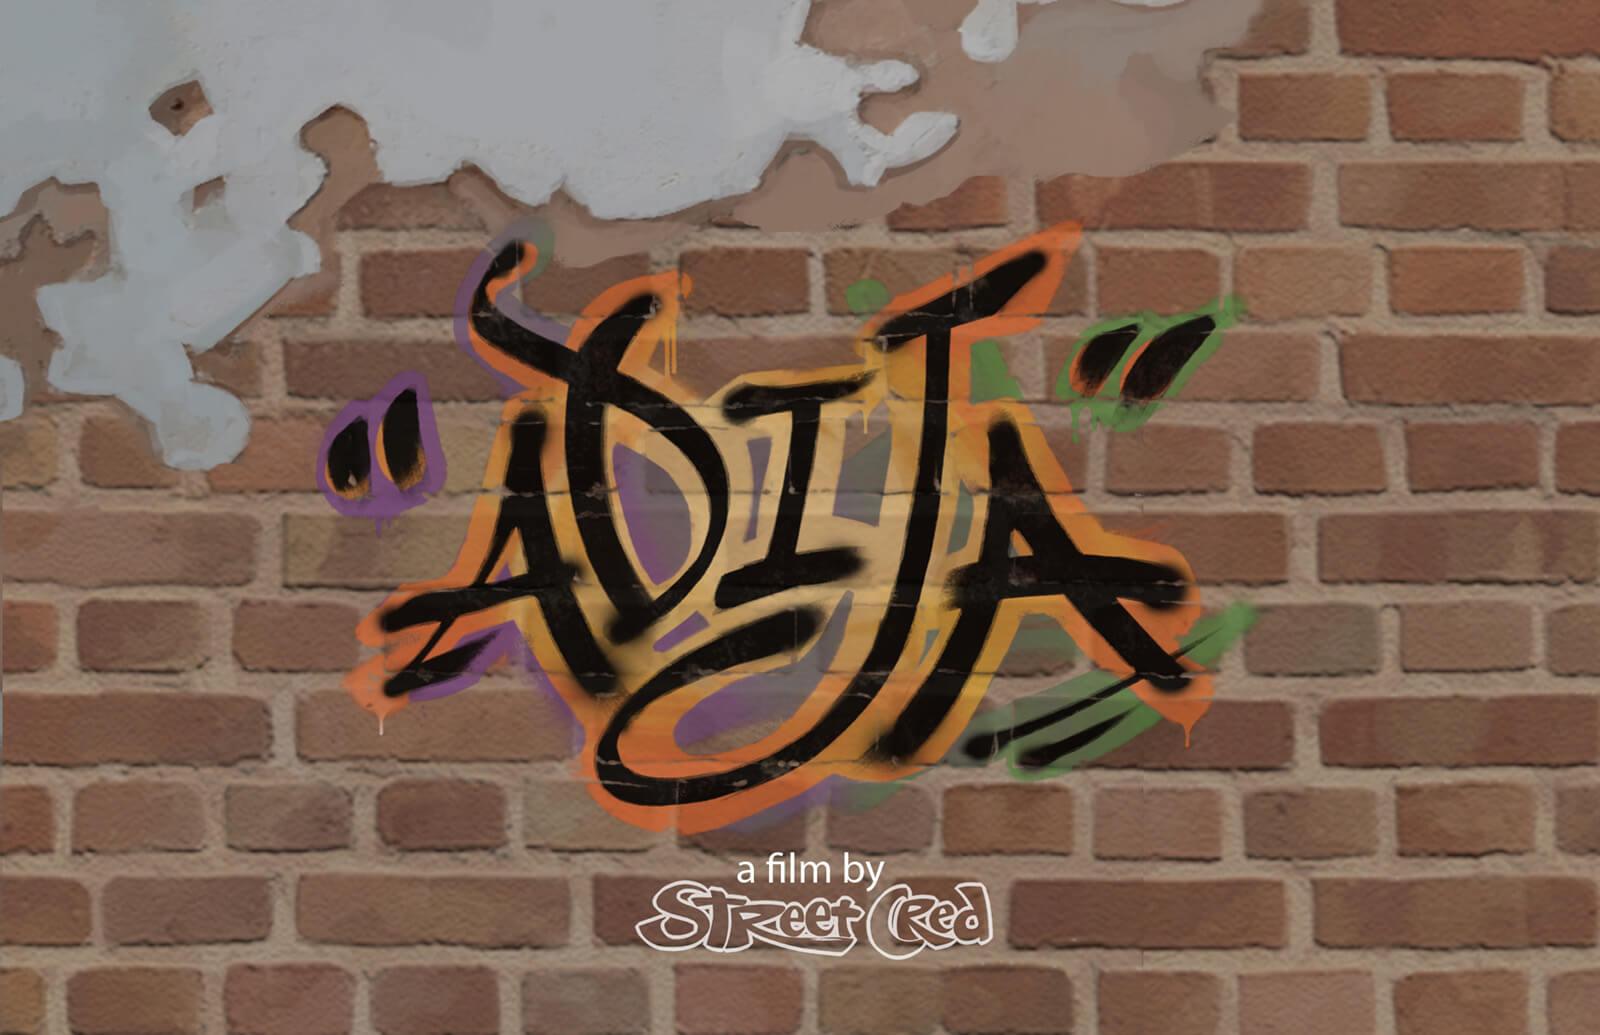 "A title card reading ""Adija"" in stylized black and orange script. ""A film by Street Cred"" is seen below."